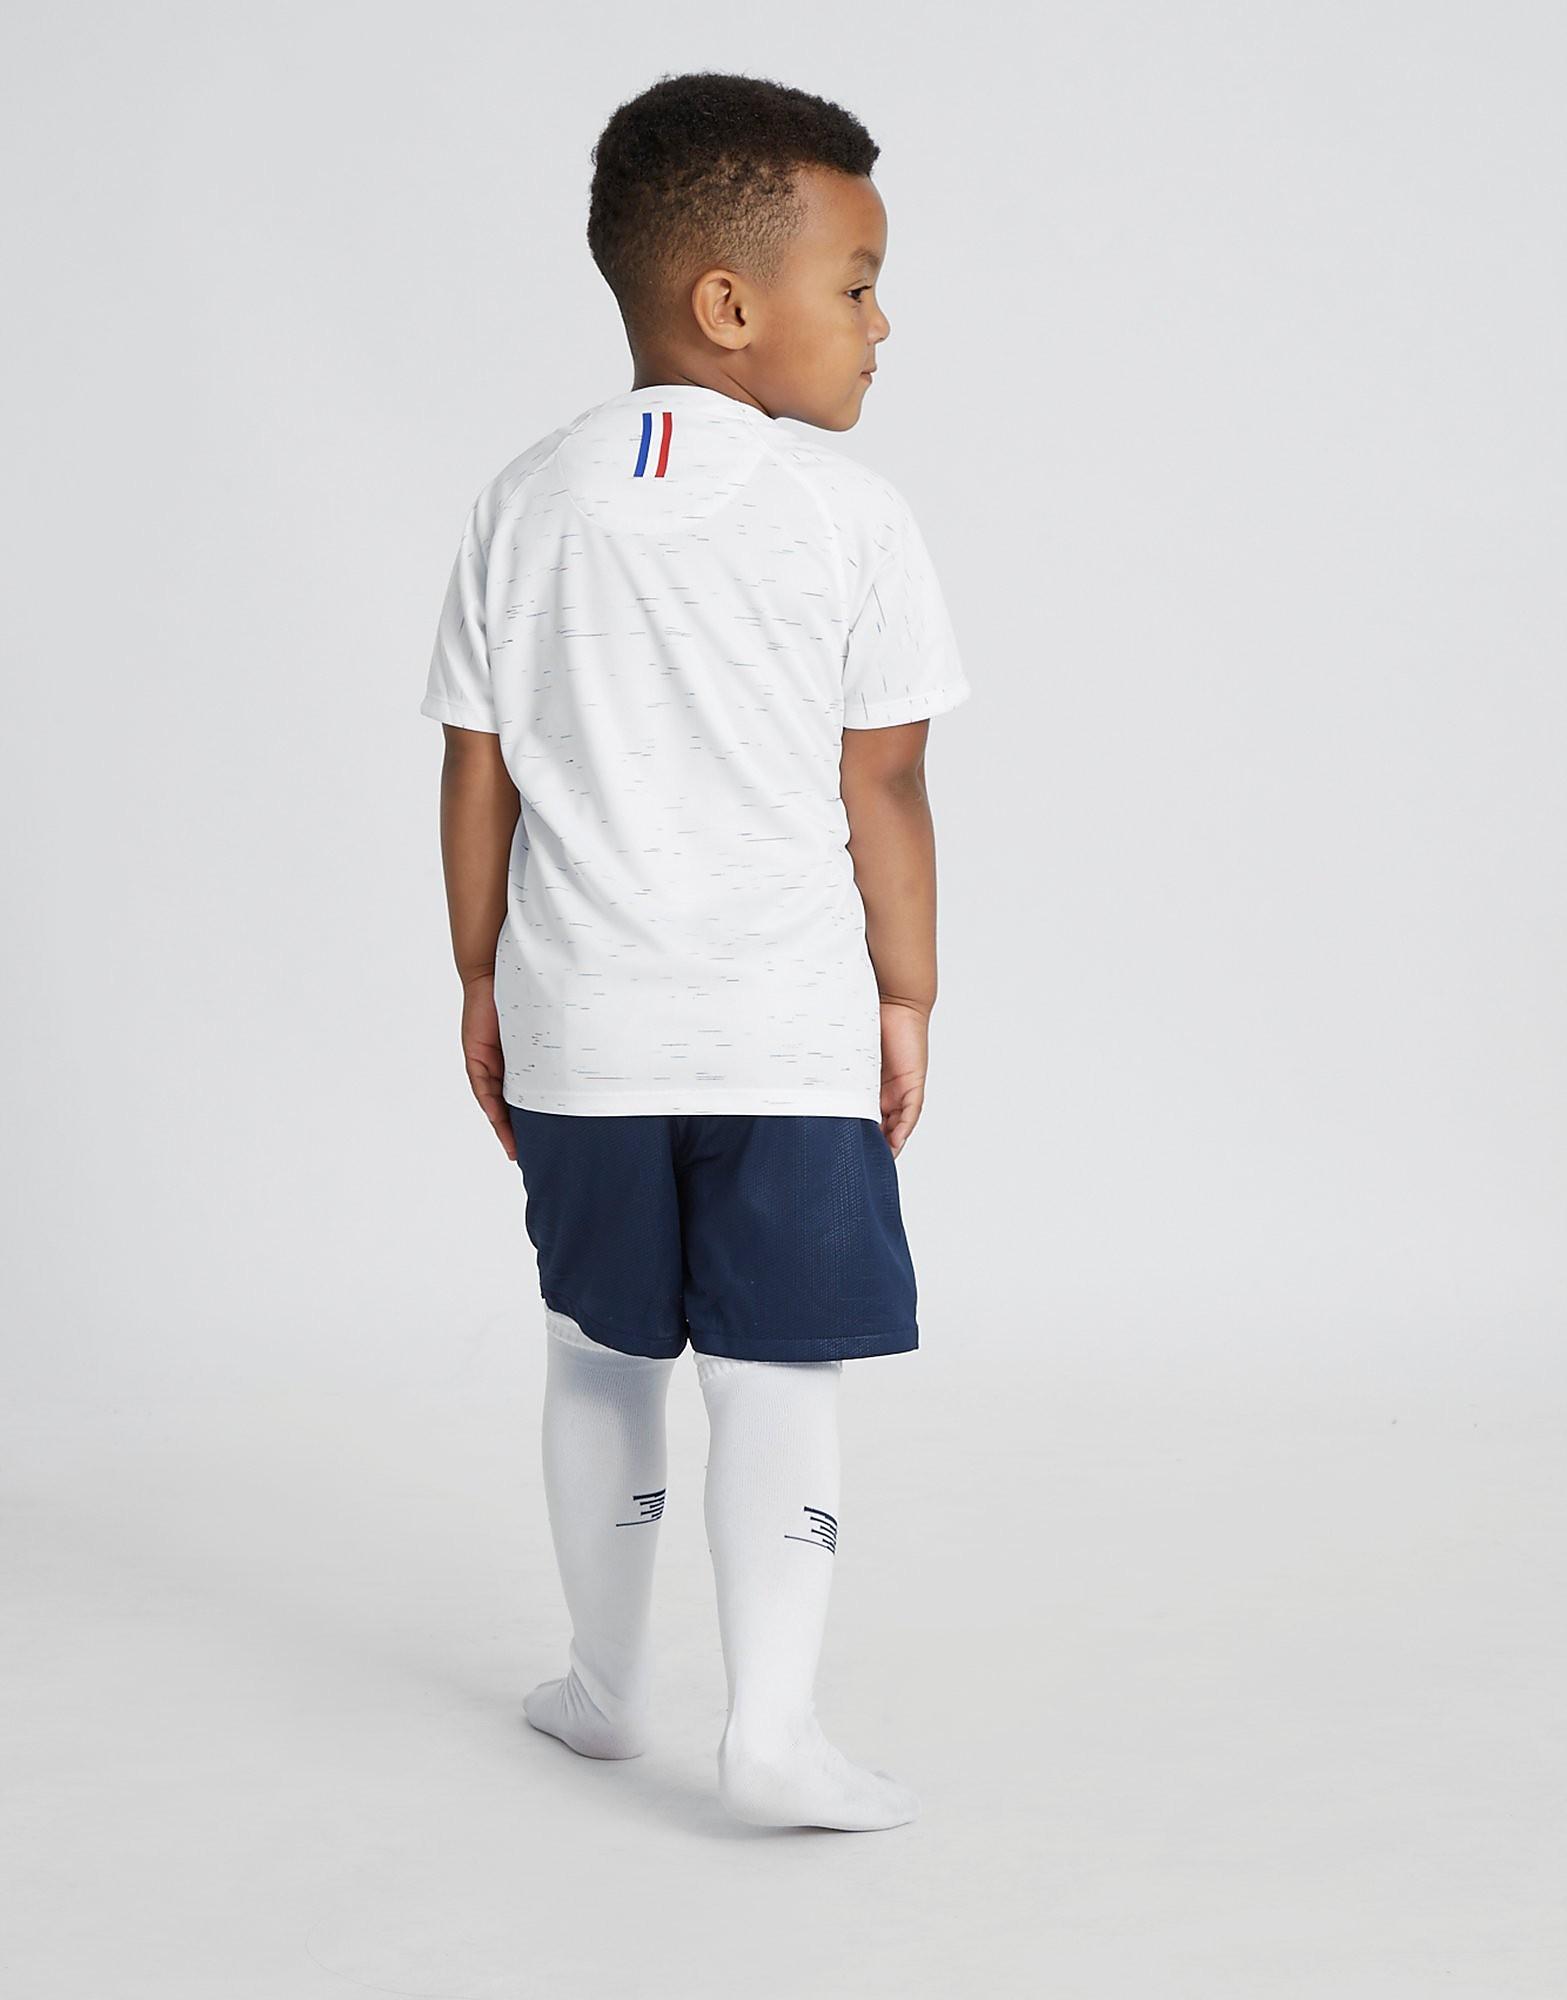 Nike Kit Extérieur France 2018 Enfant